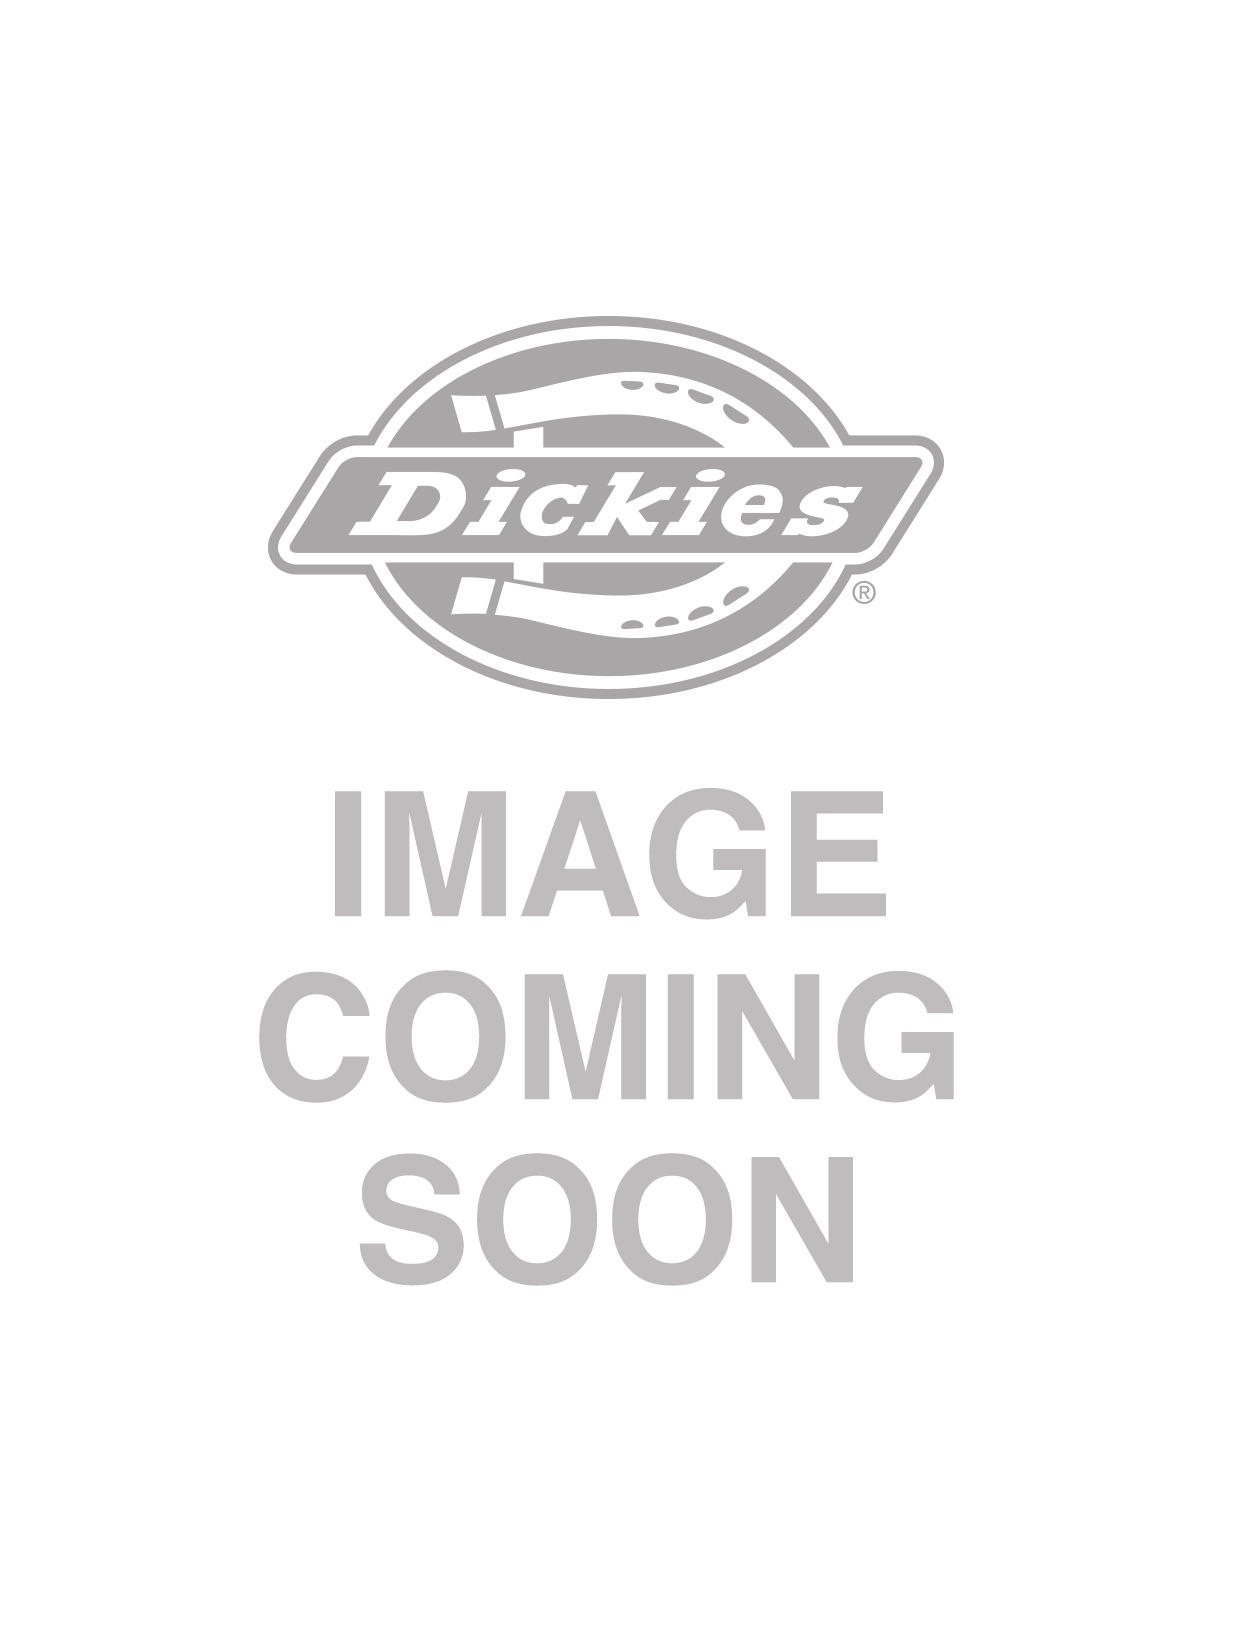 c29252db64 Dickies 874 Flex Work Pant